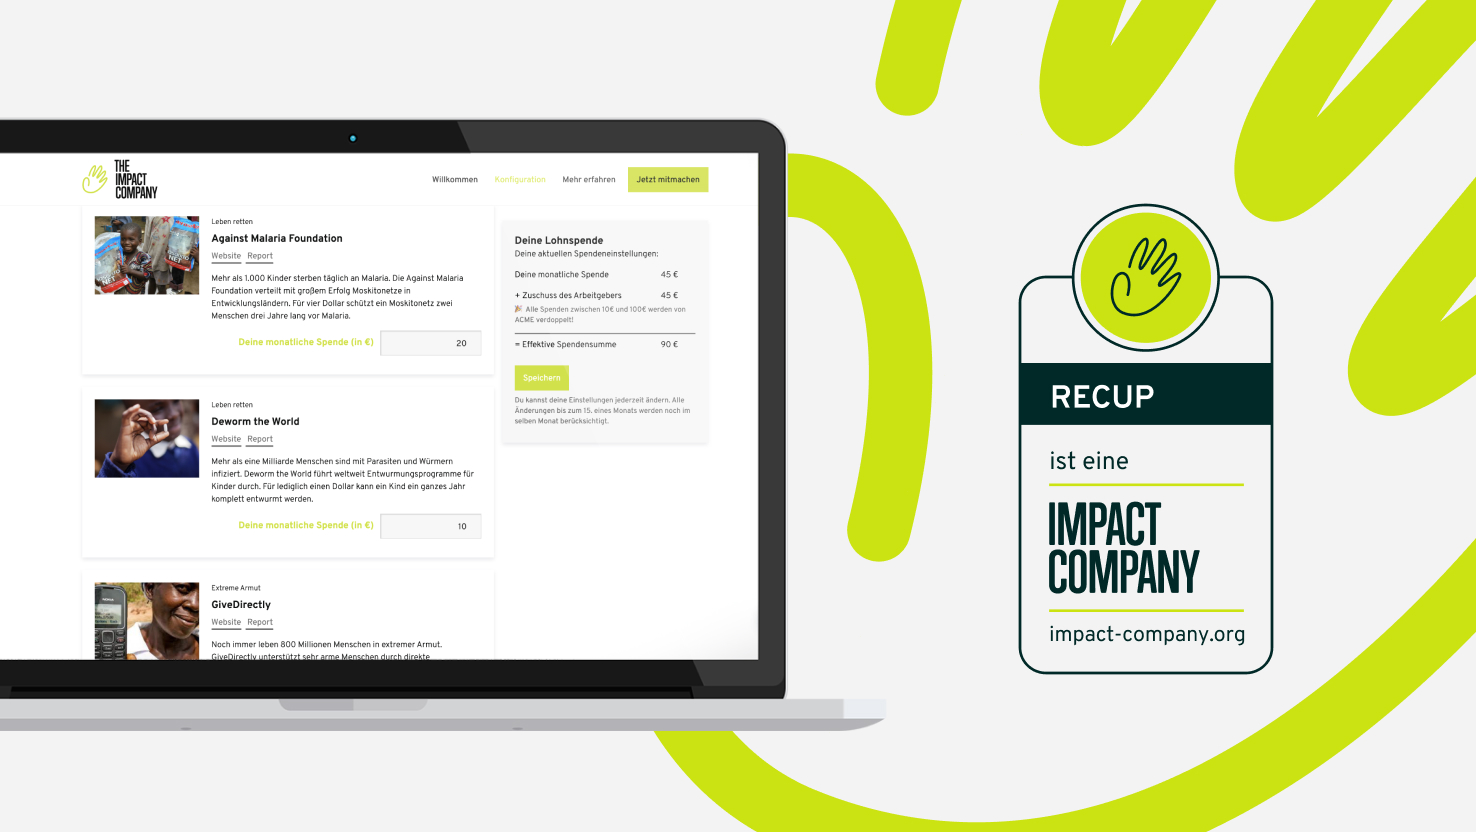 RECUP The Impact Company